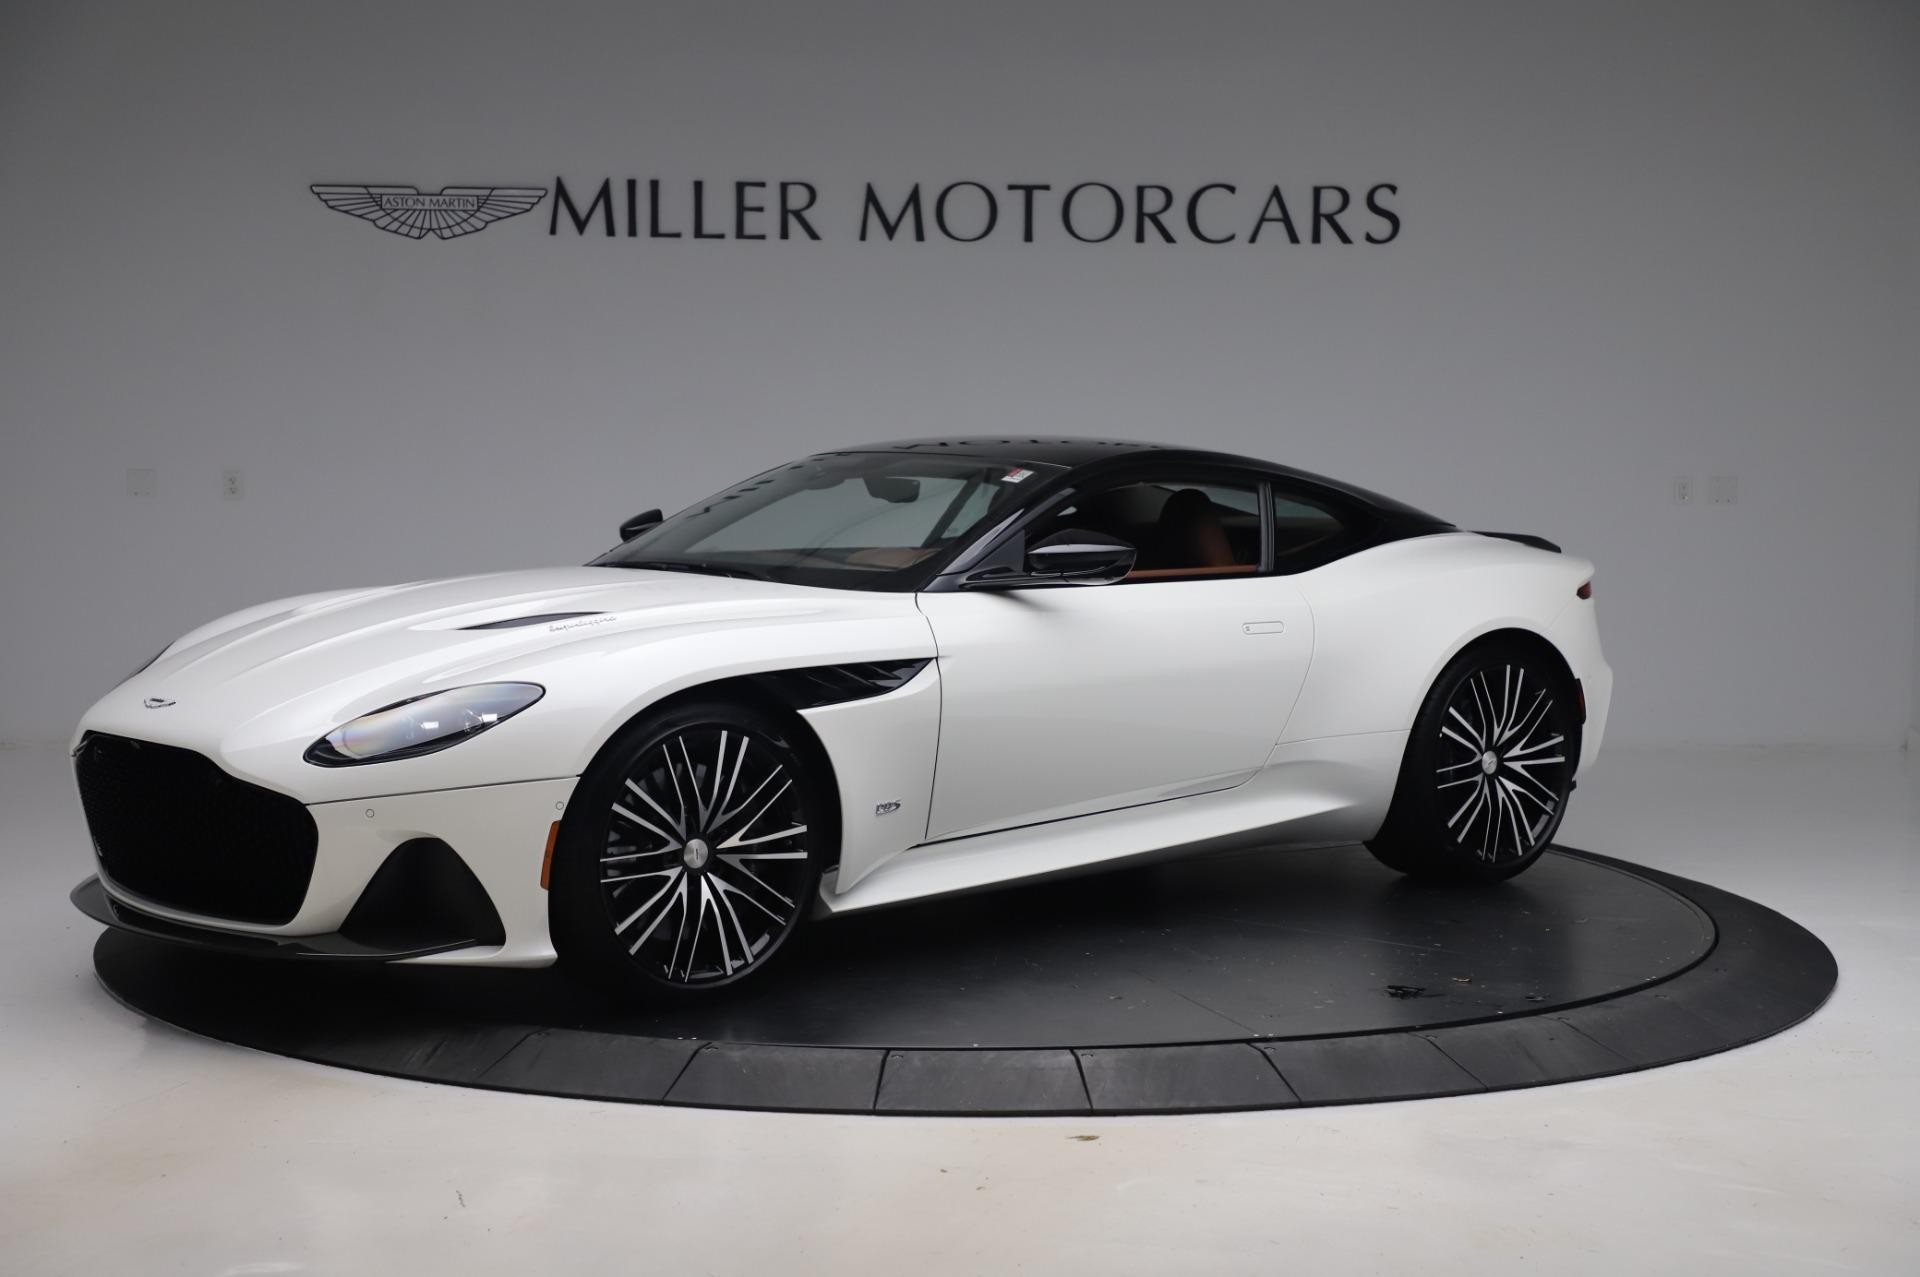 Used 2020 Aston Martin DBS Superleggera for sale $299,990 at McLaren Greenwich in Greenwich CT 06830 1